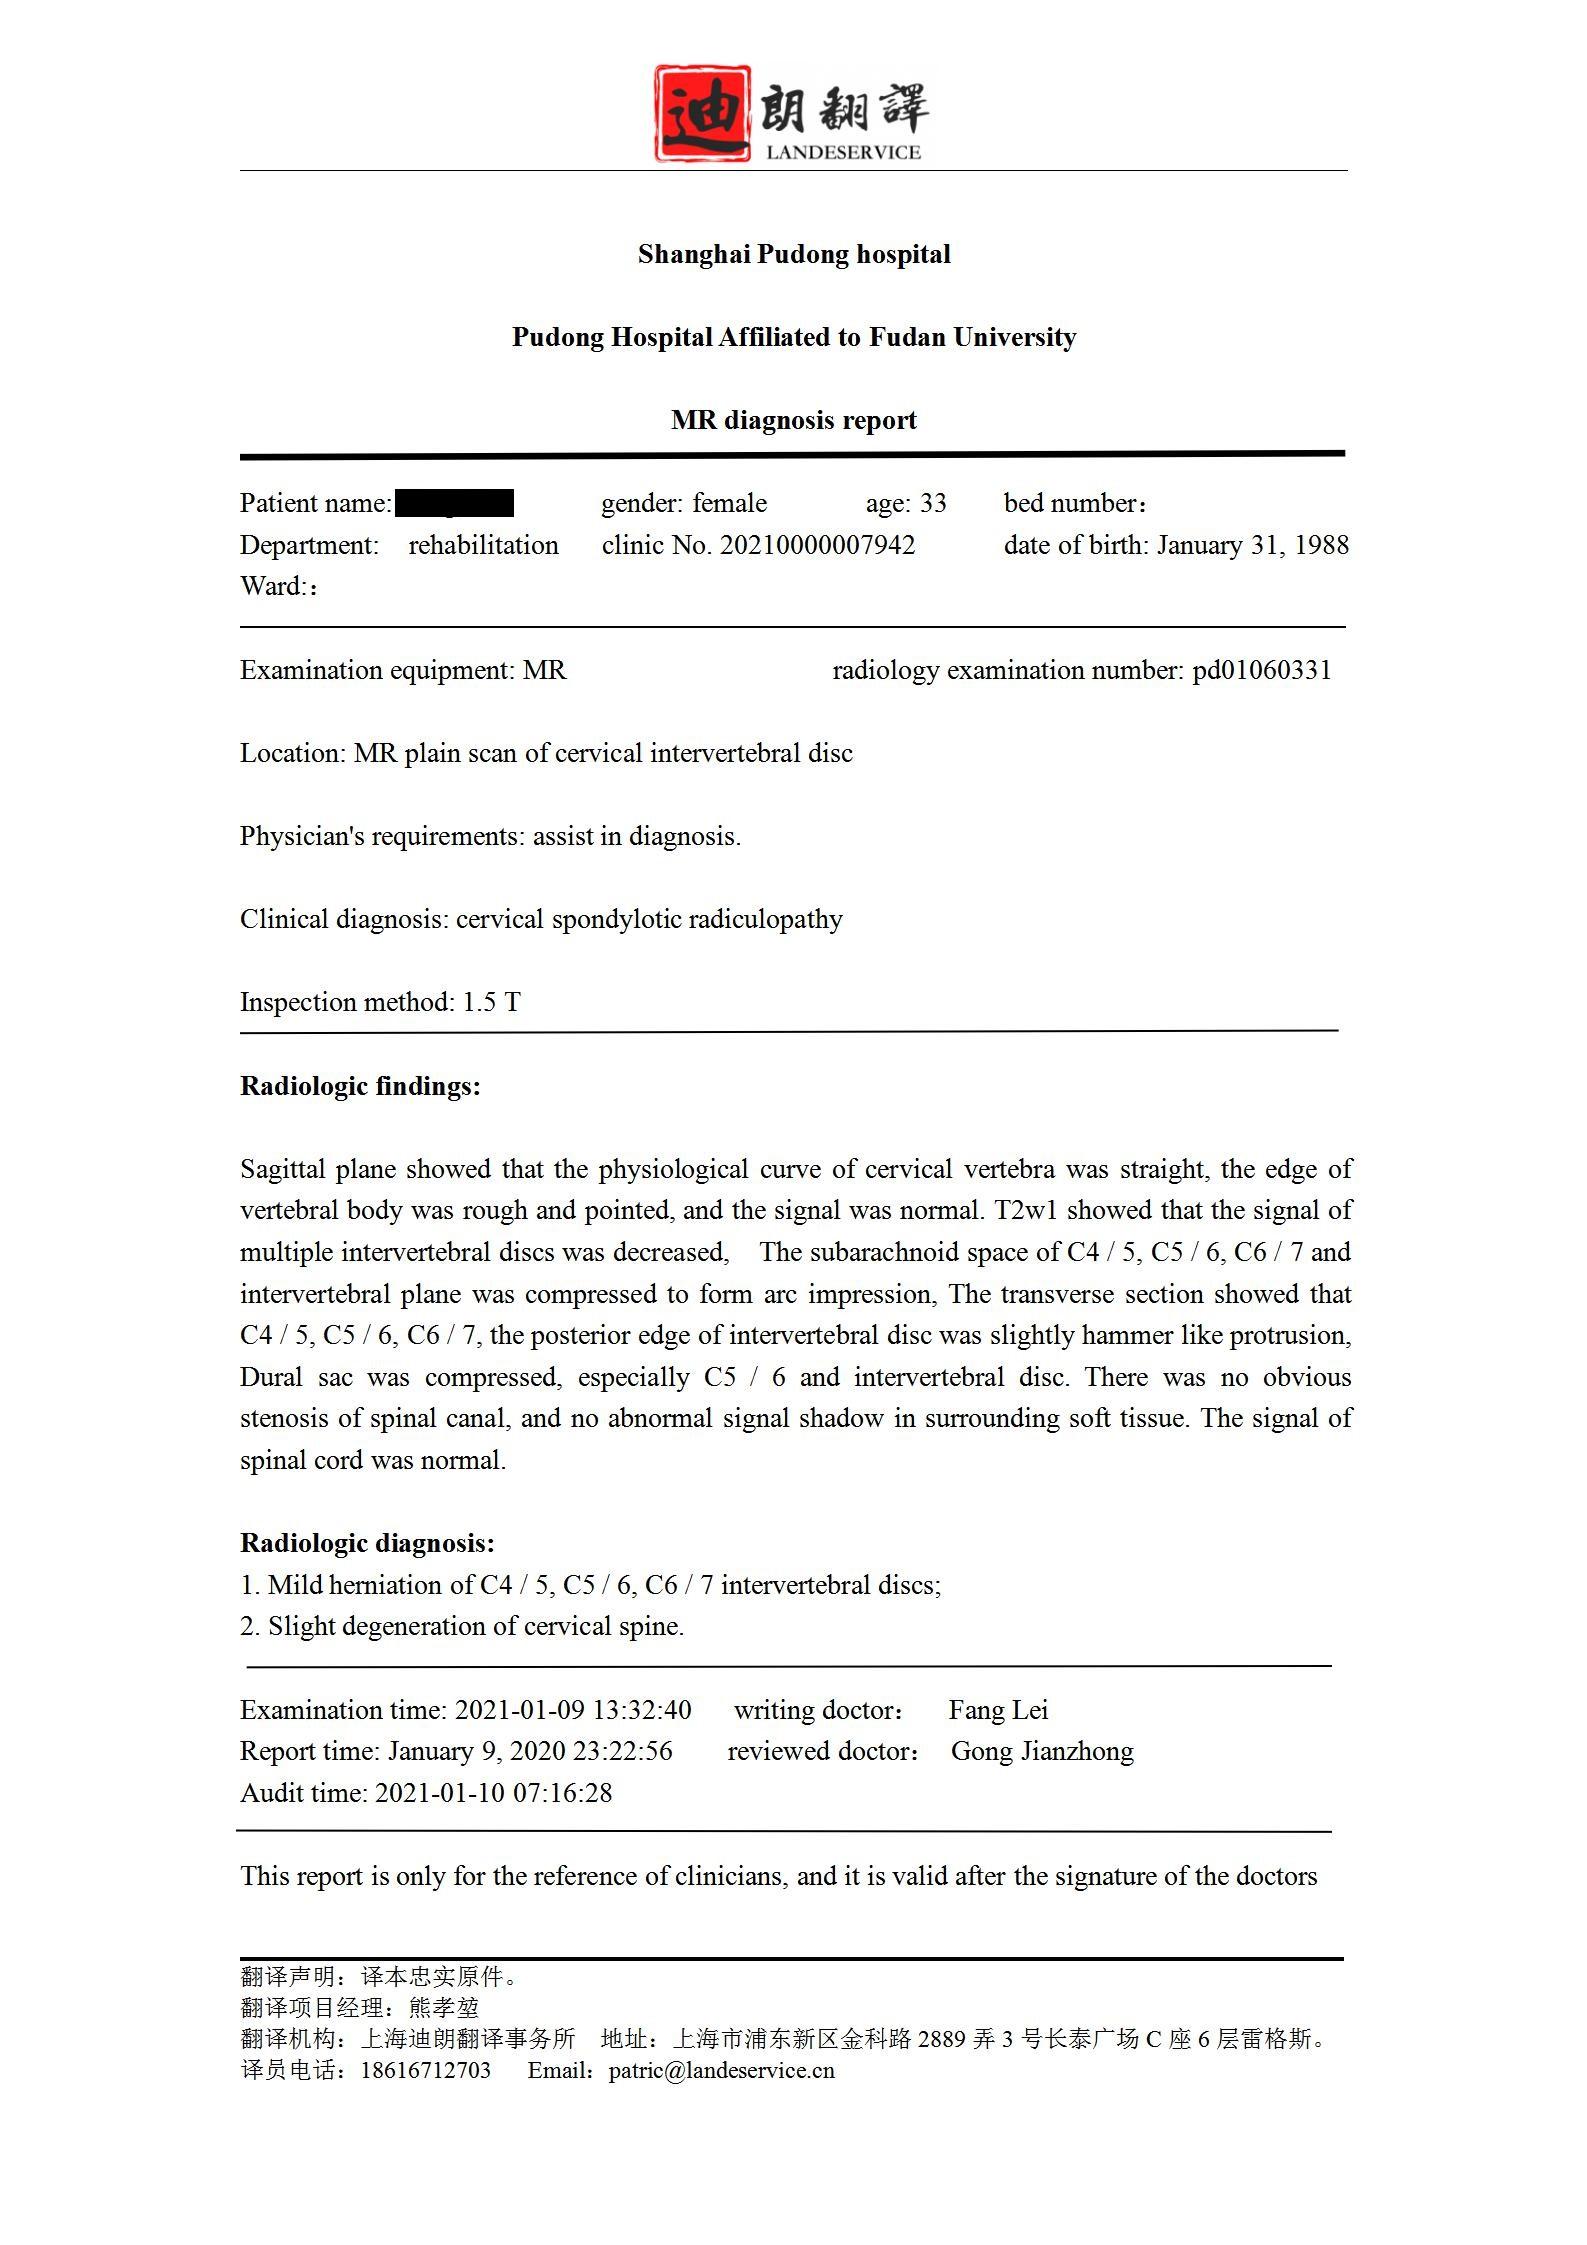 MR 报告 01 - 医学诊断报告翻译认证盖章